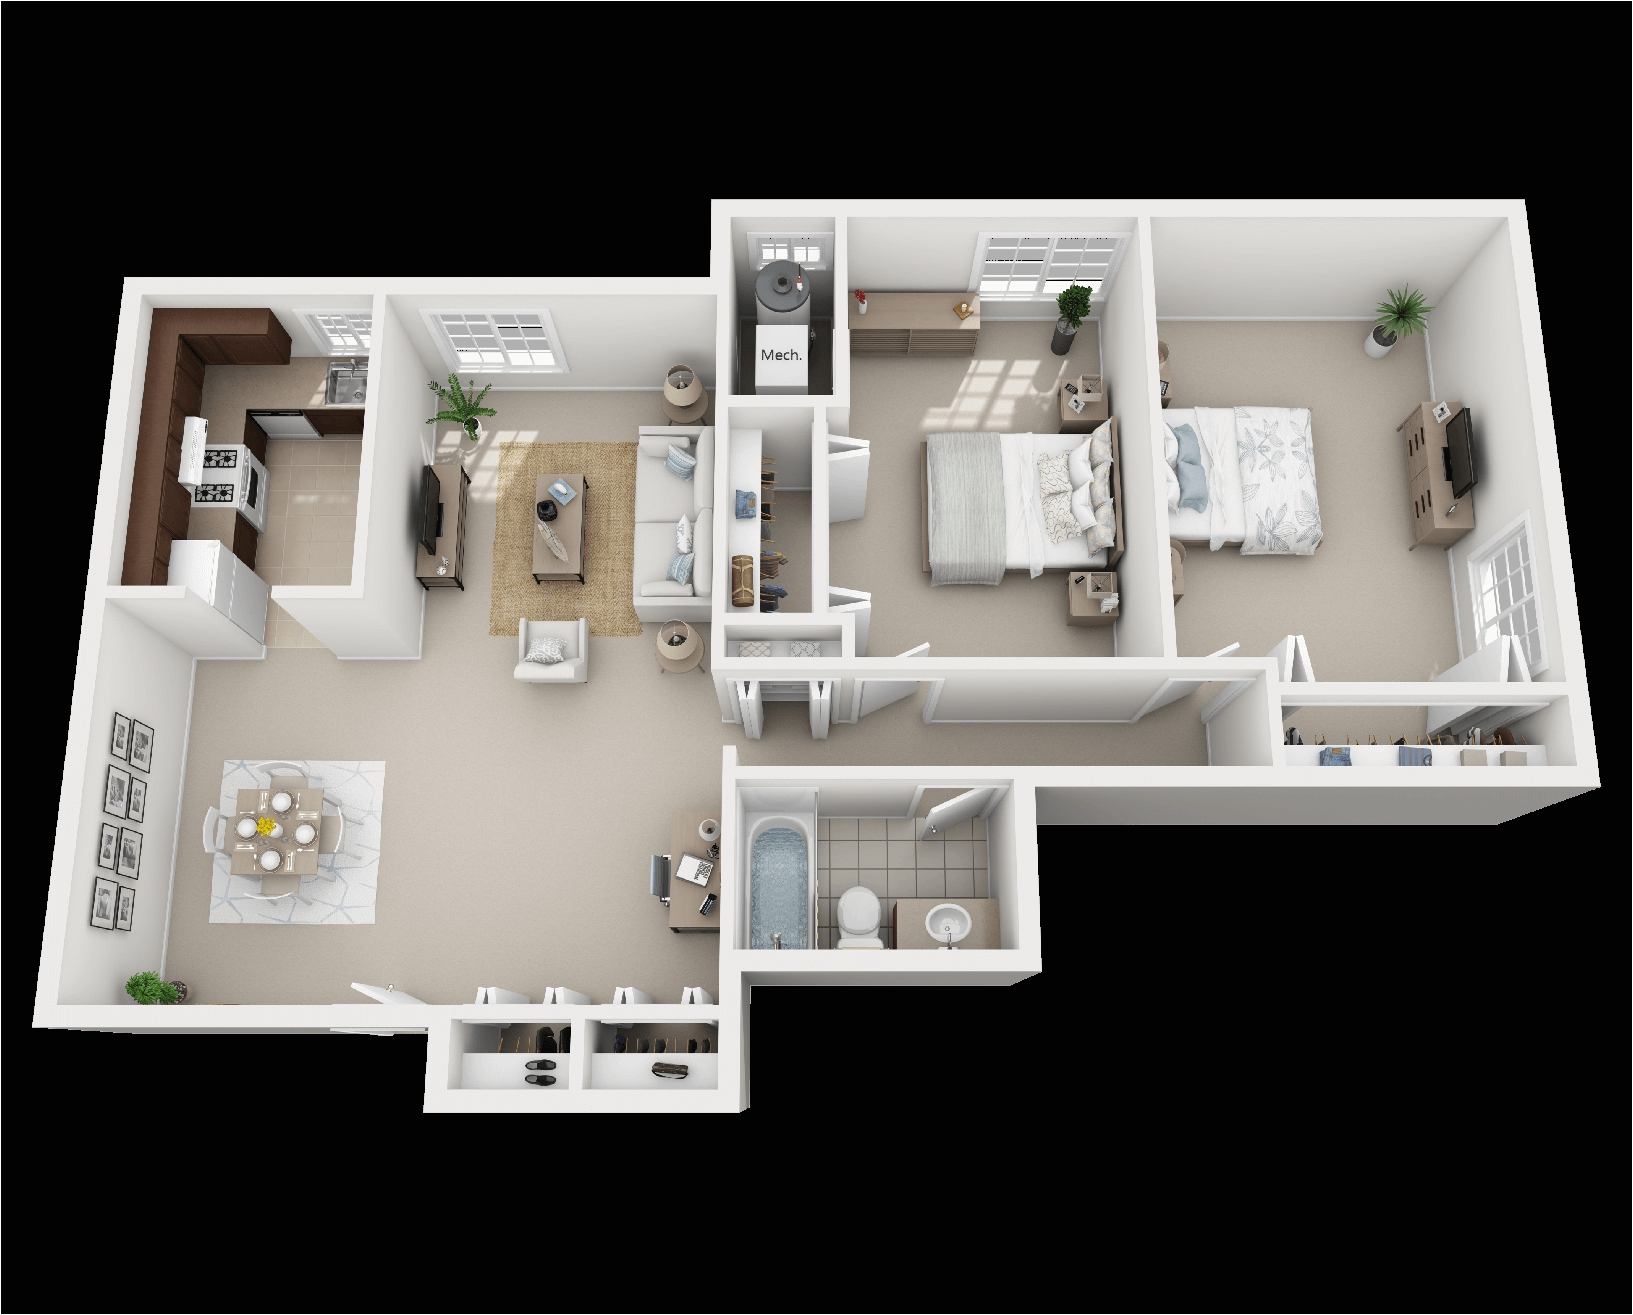 2 bedroom layout b